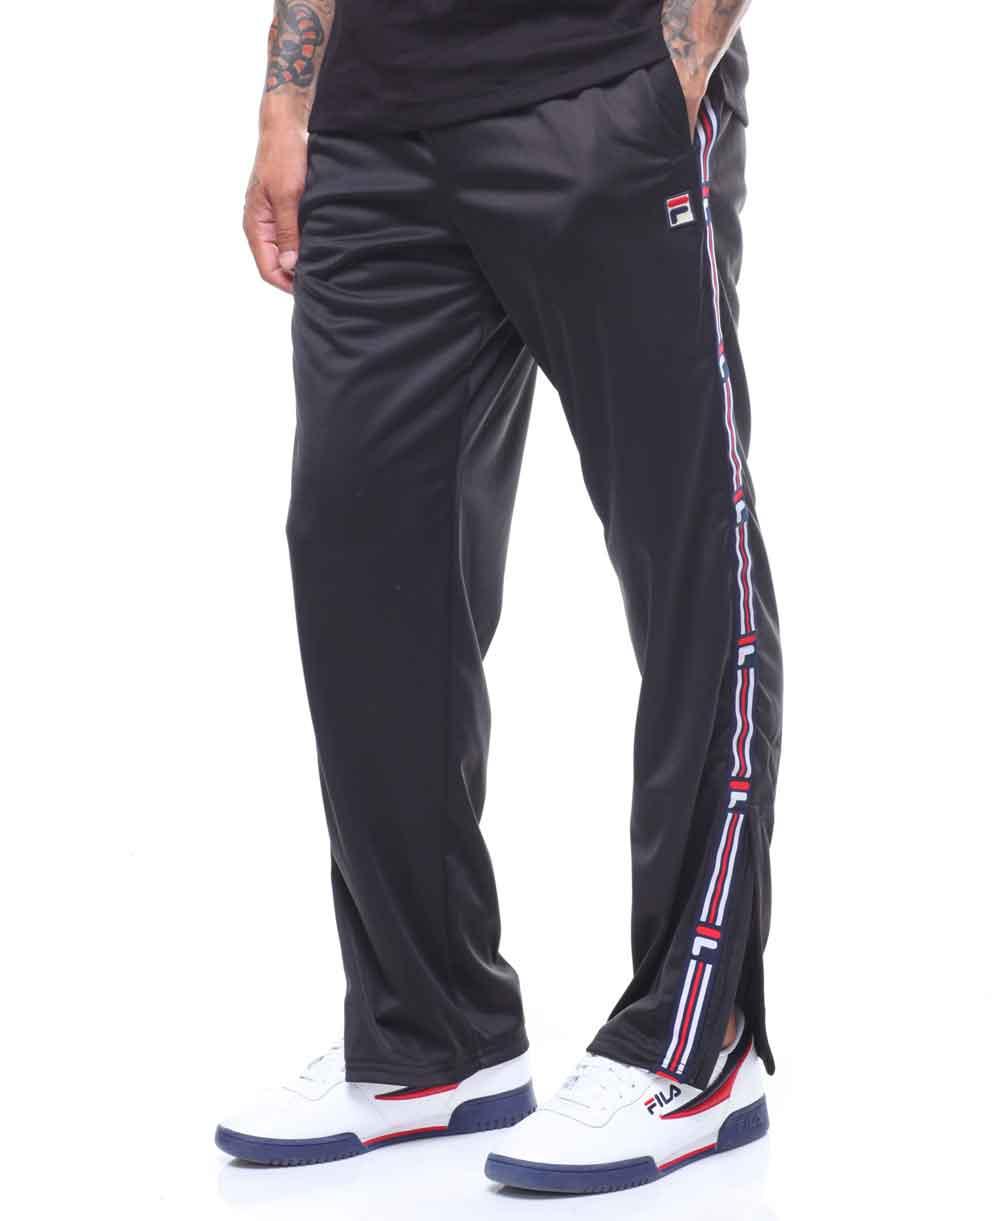 Men's Fleece Pants Ush Tape Black